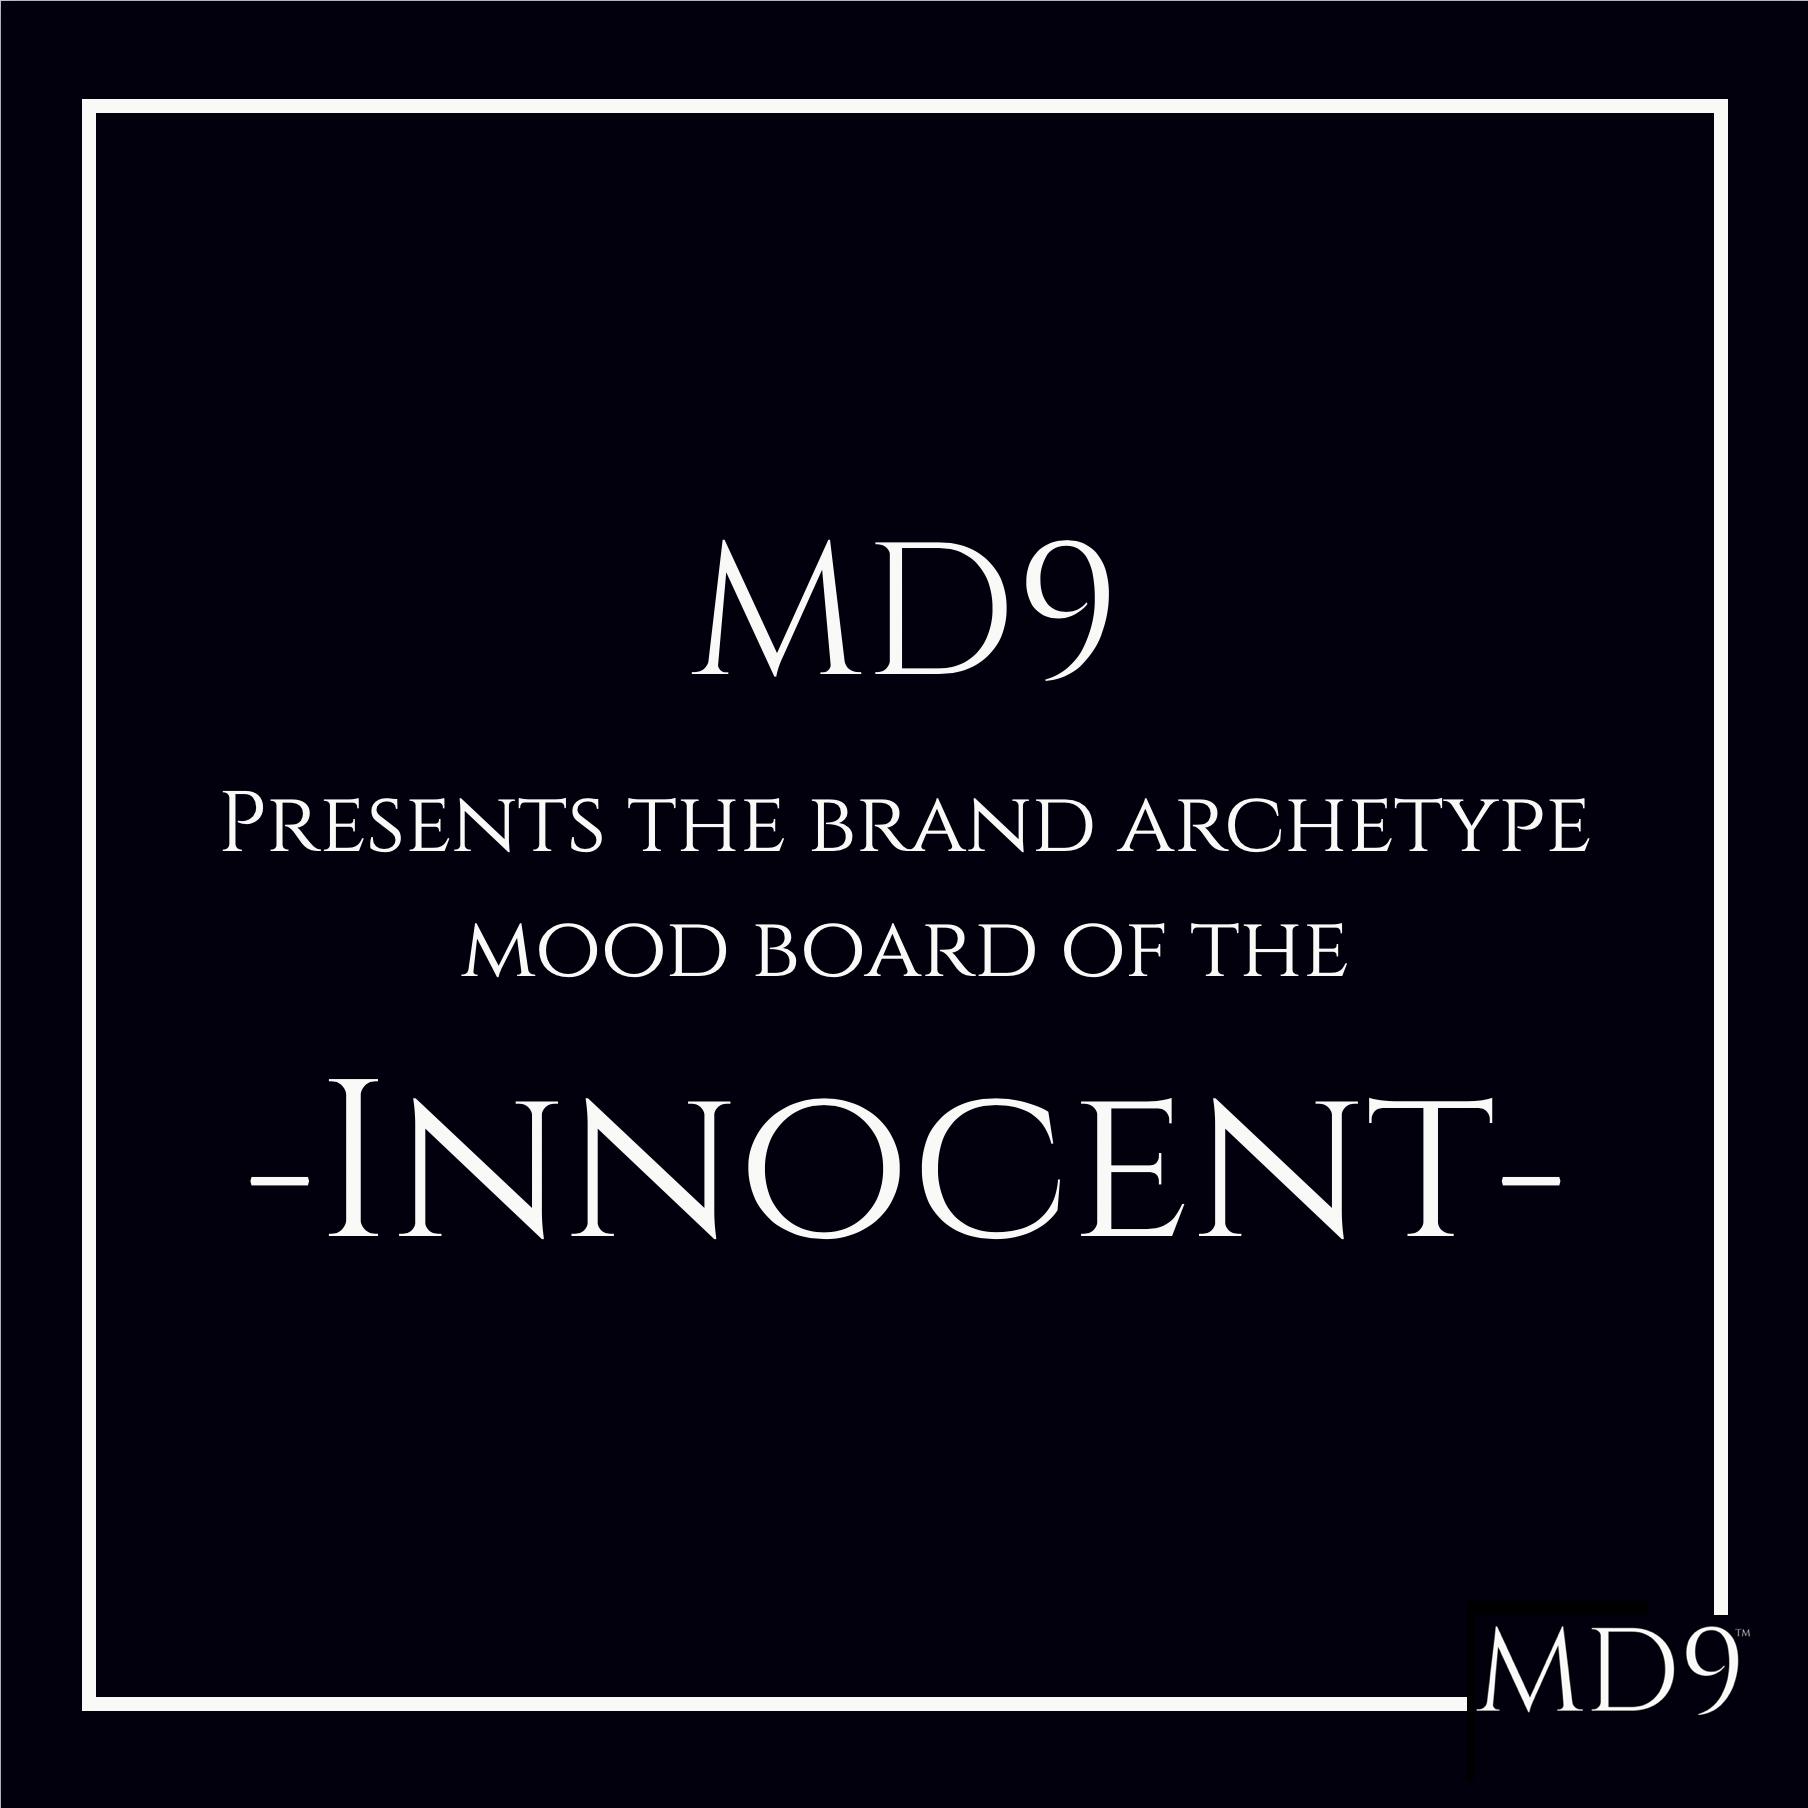 MD9's Brand Archetype Mood Board – Innocent